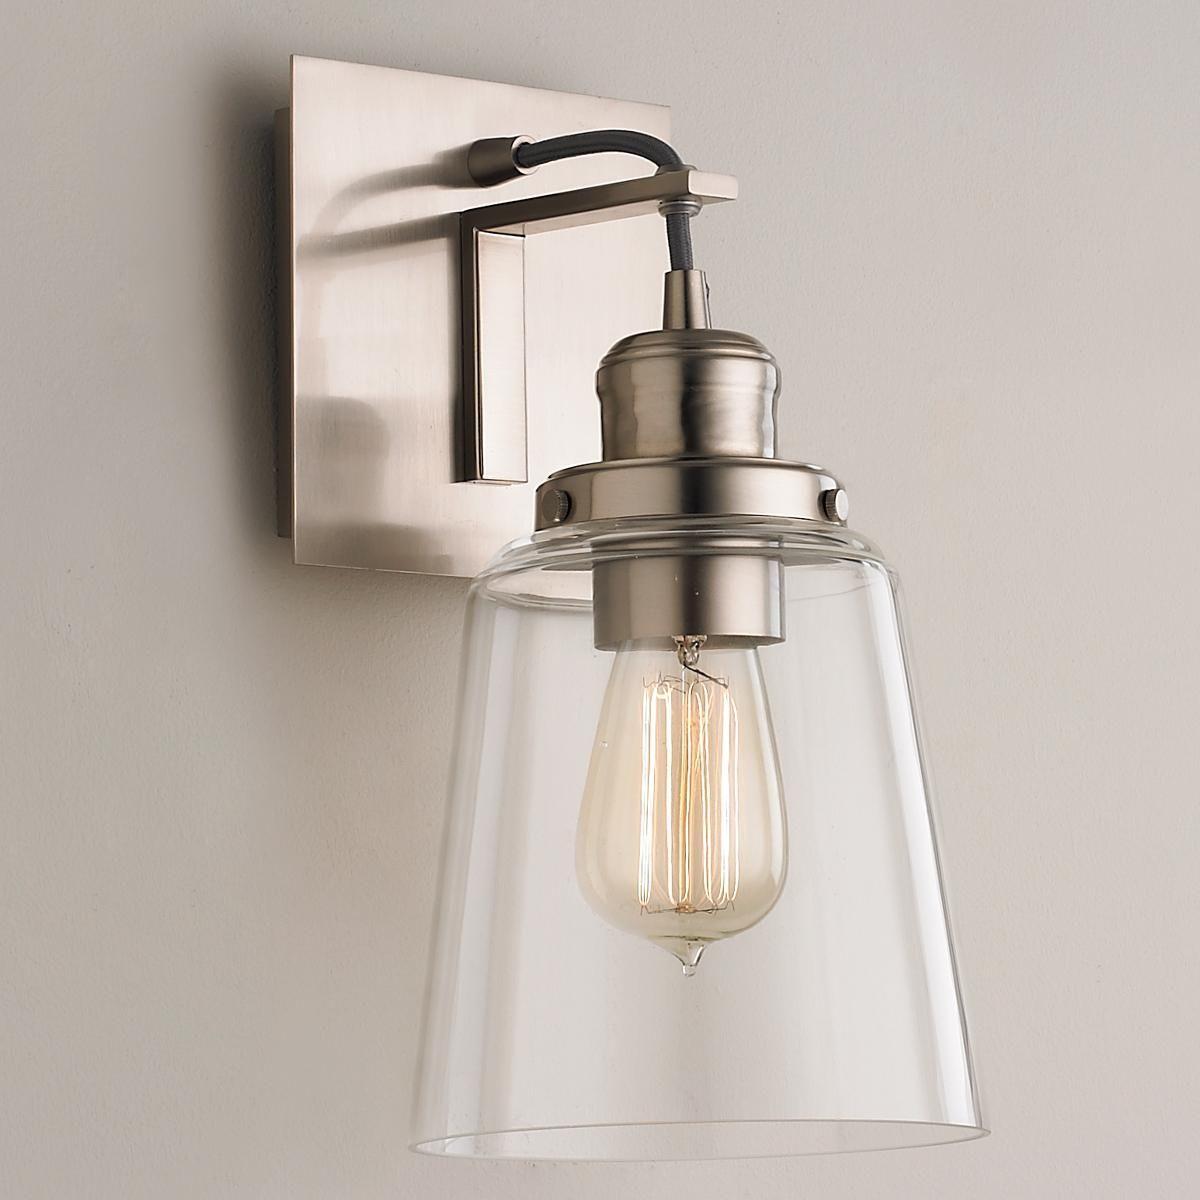 Modern Plug In Wall Sconce